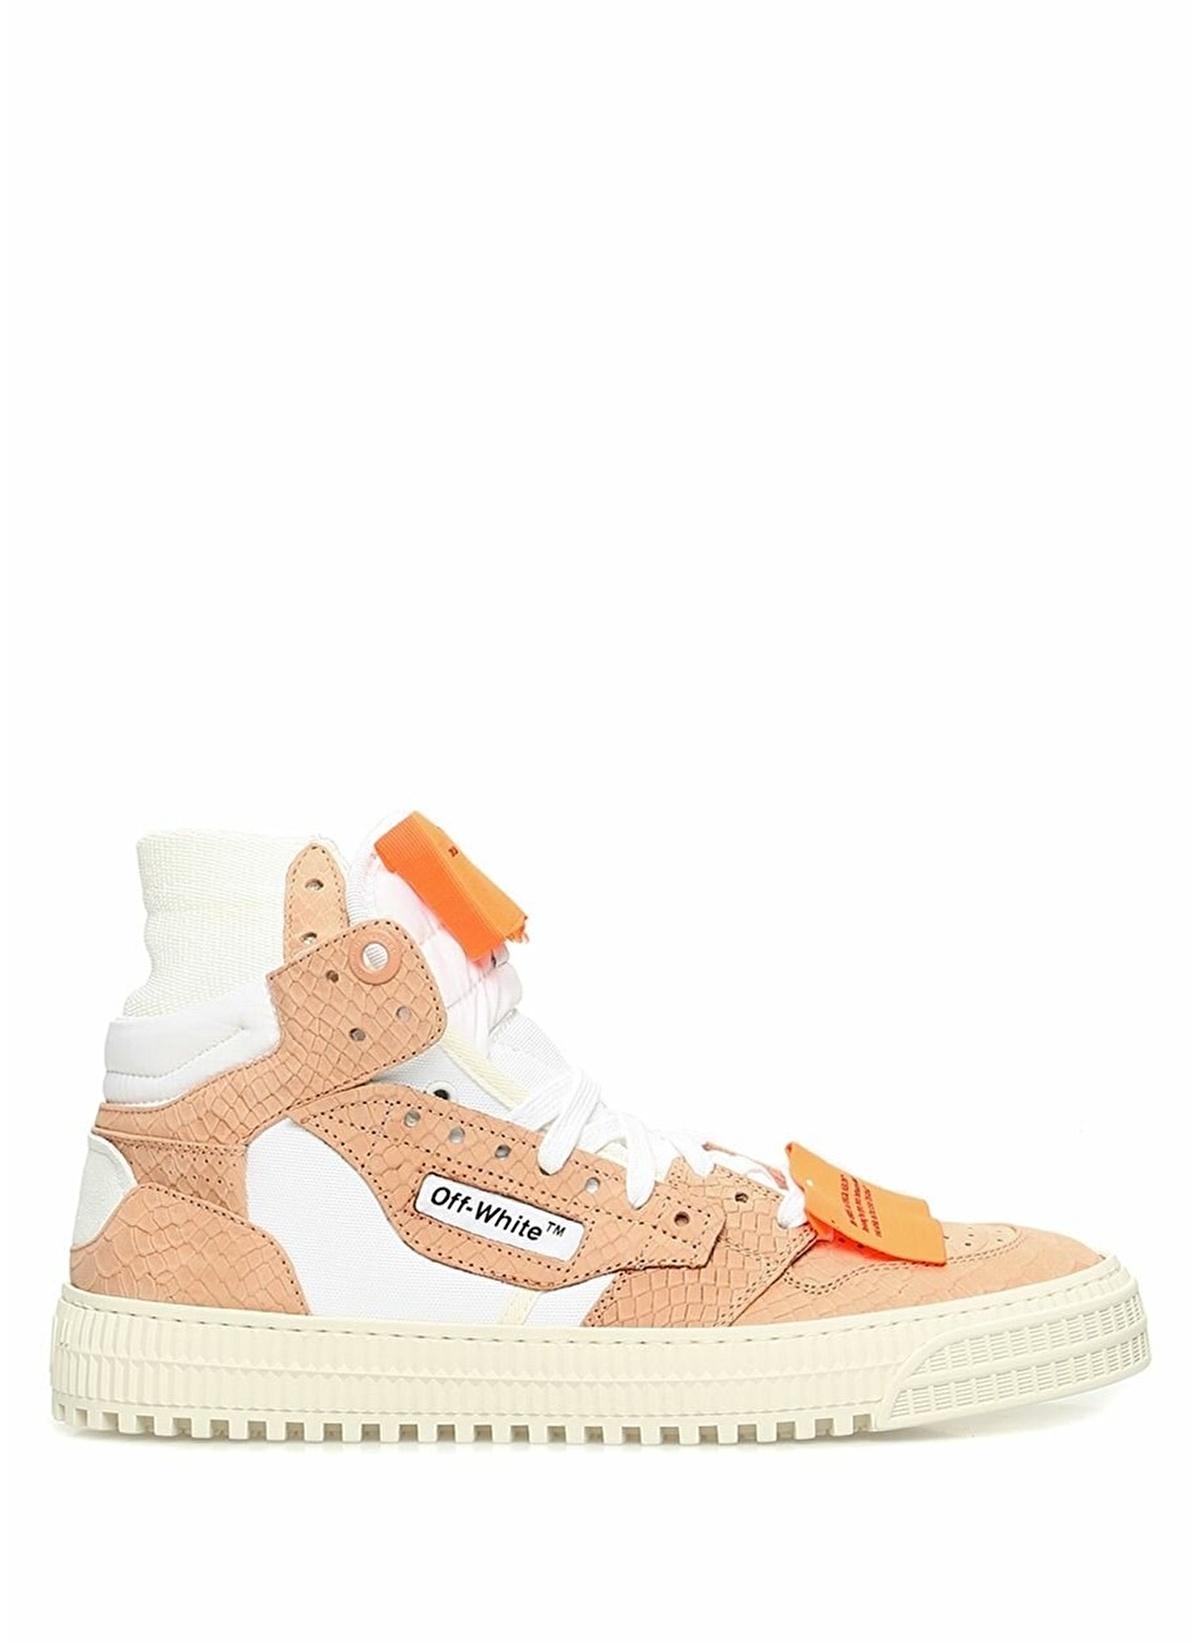 Off-white Sneakers 101306267 K Sneakers – 2249.0 TL